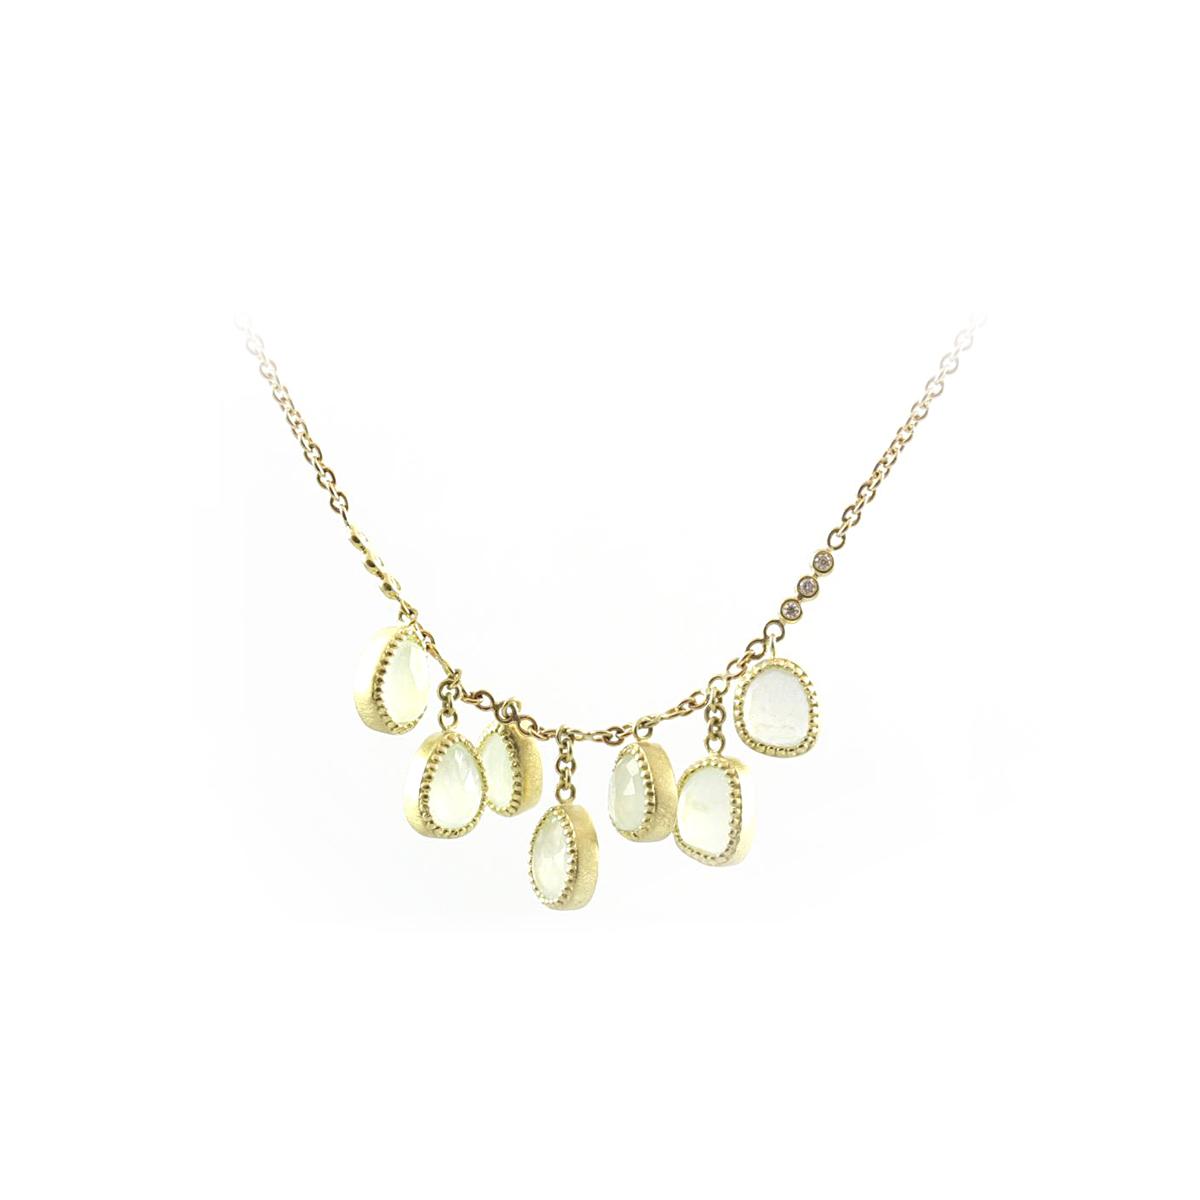 Lauren K 18 Karat Yellow Gold Freeform Aqua and Diamond Necklace